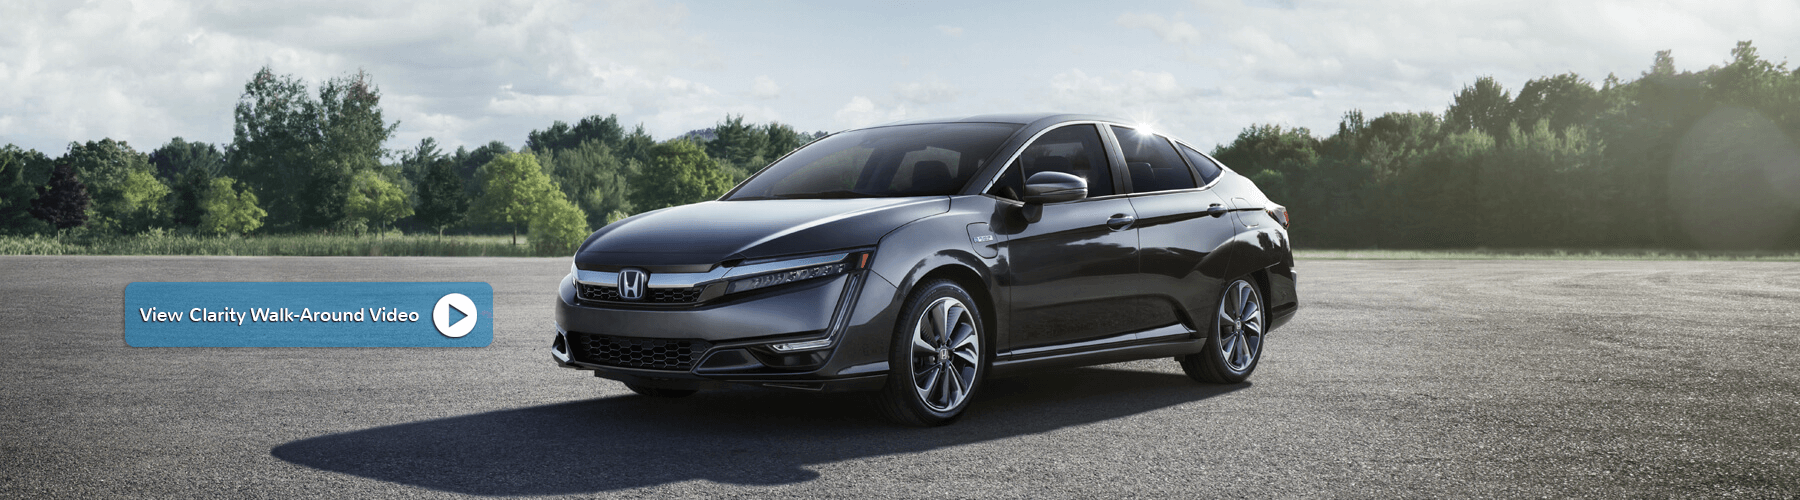 2018 Honda Clarity Plug-In Hybrid Banner